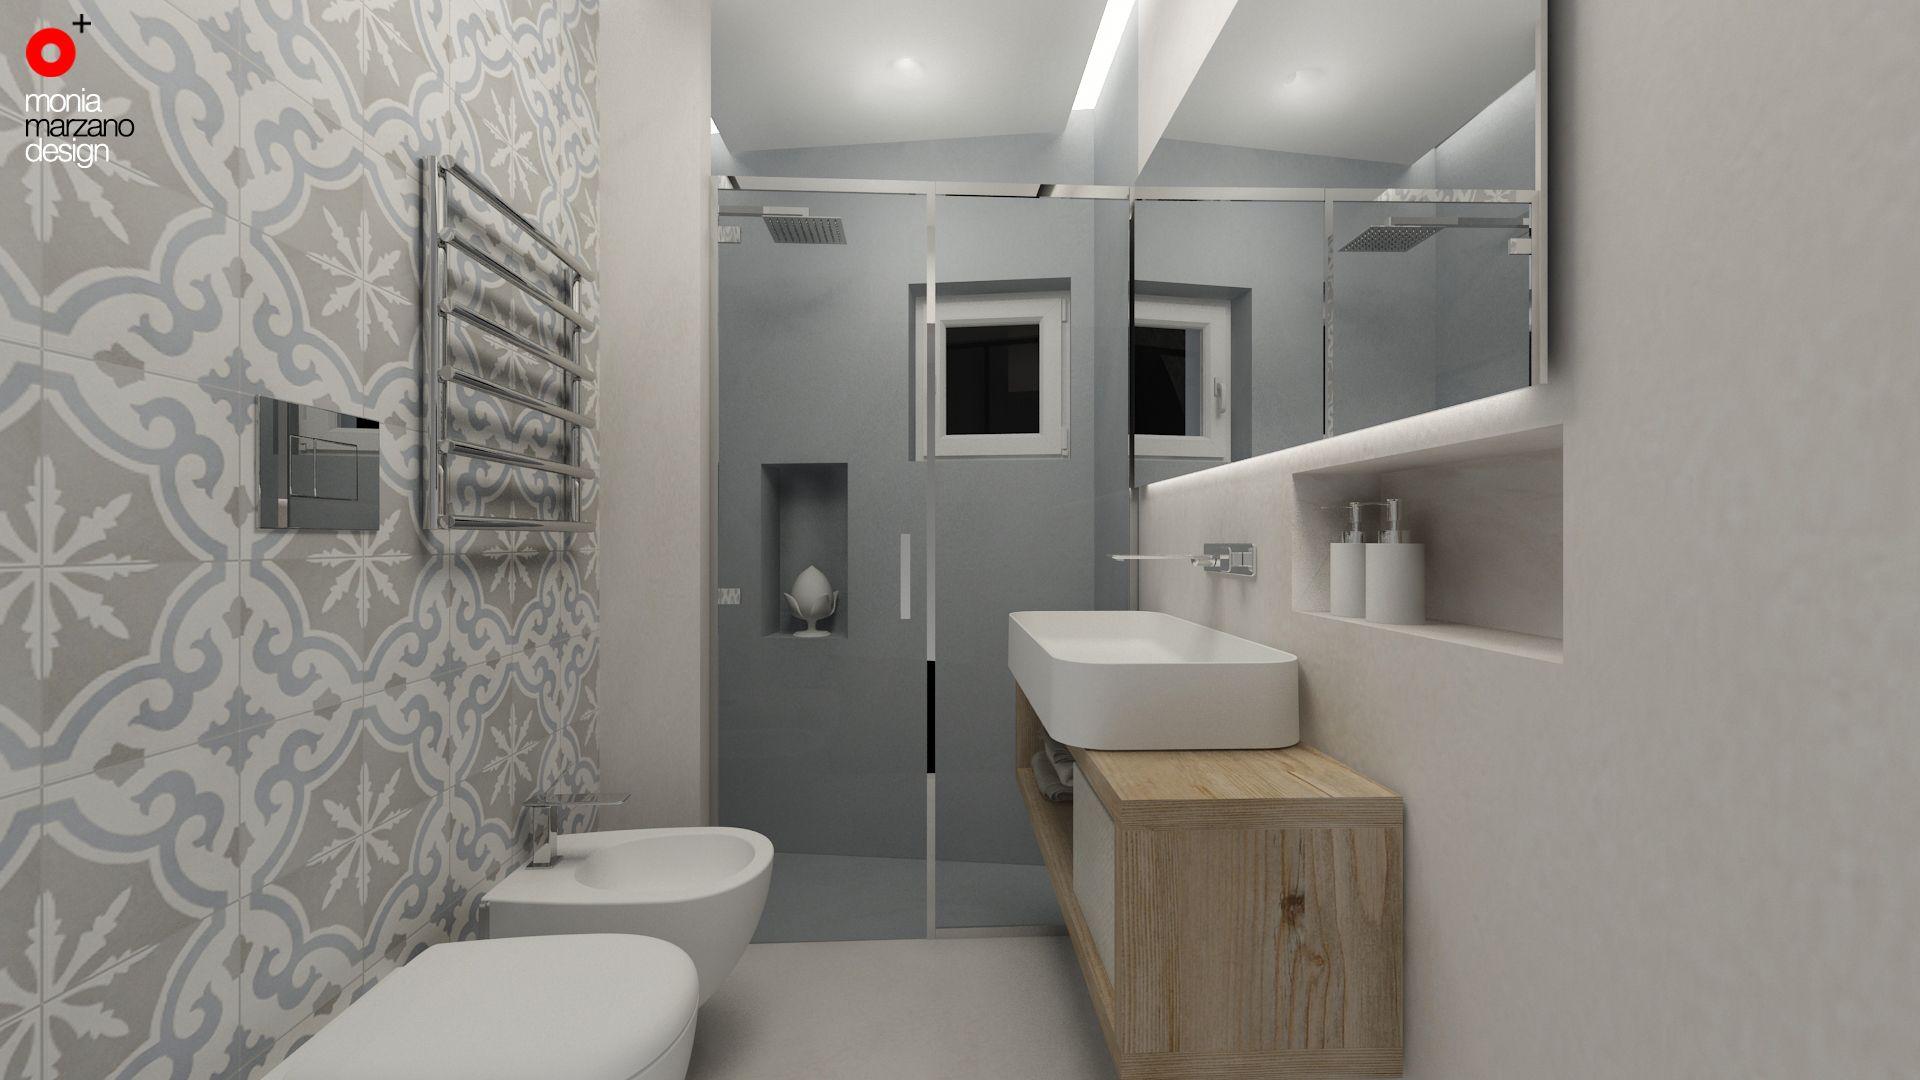 Bathroom interior hd pajara salentina l interior design l by monia marzano design